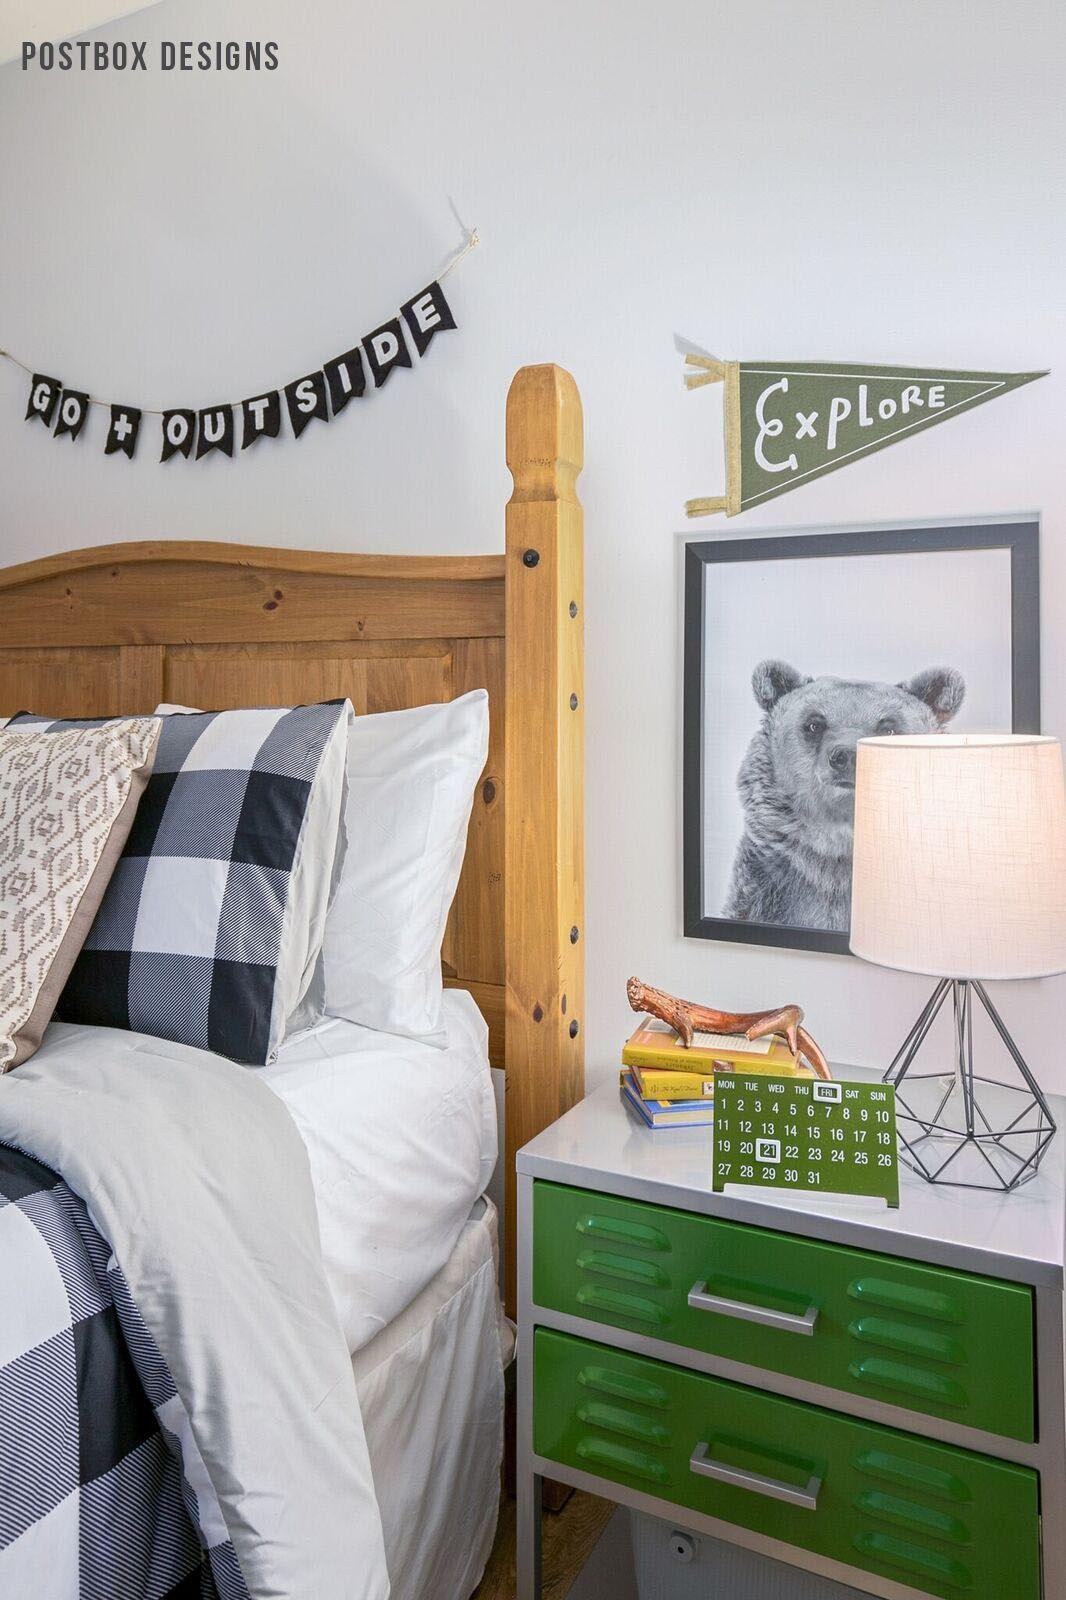 Postbox Designs Boyu0027s Adventure Bedroom Makeover